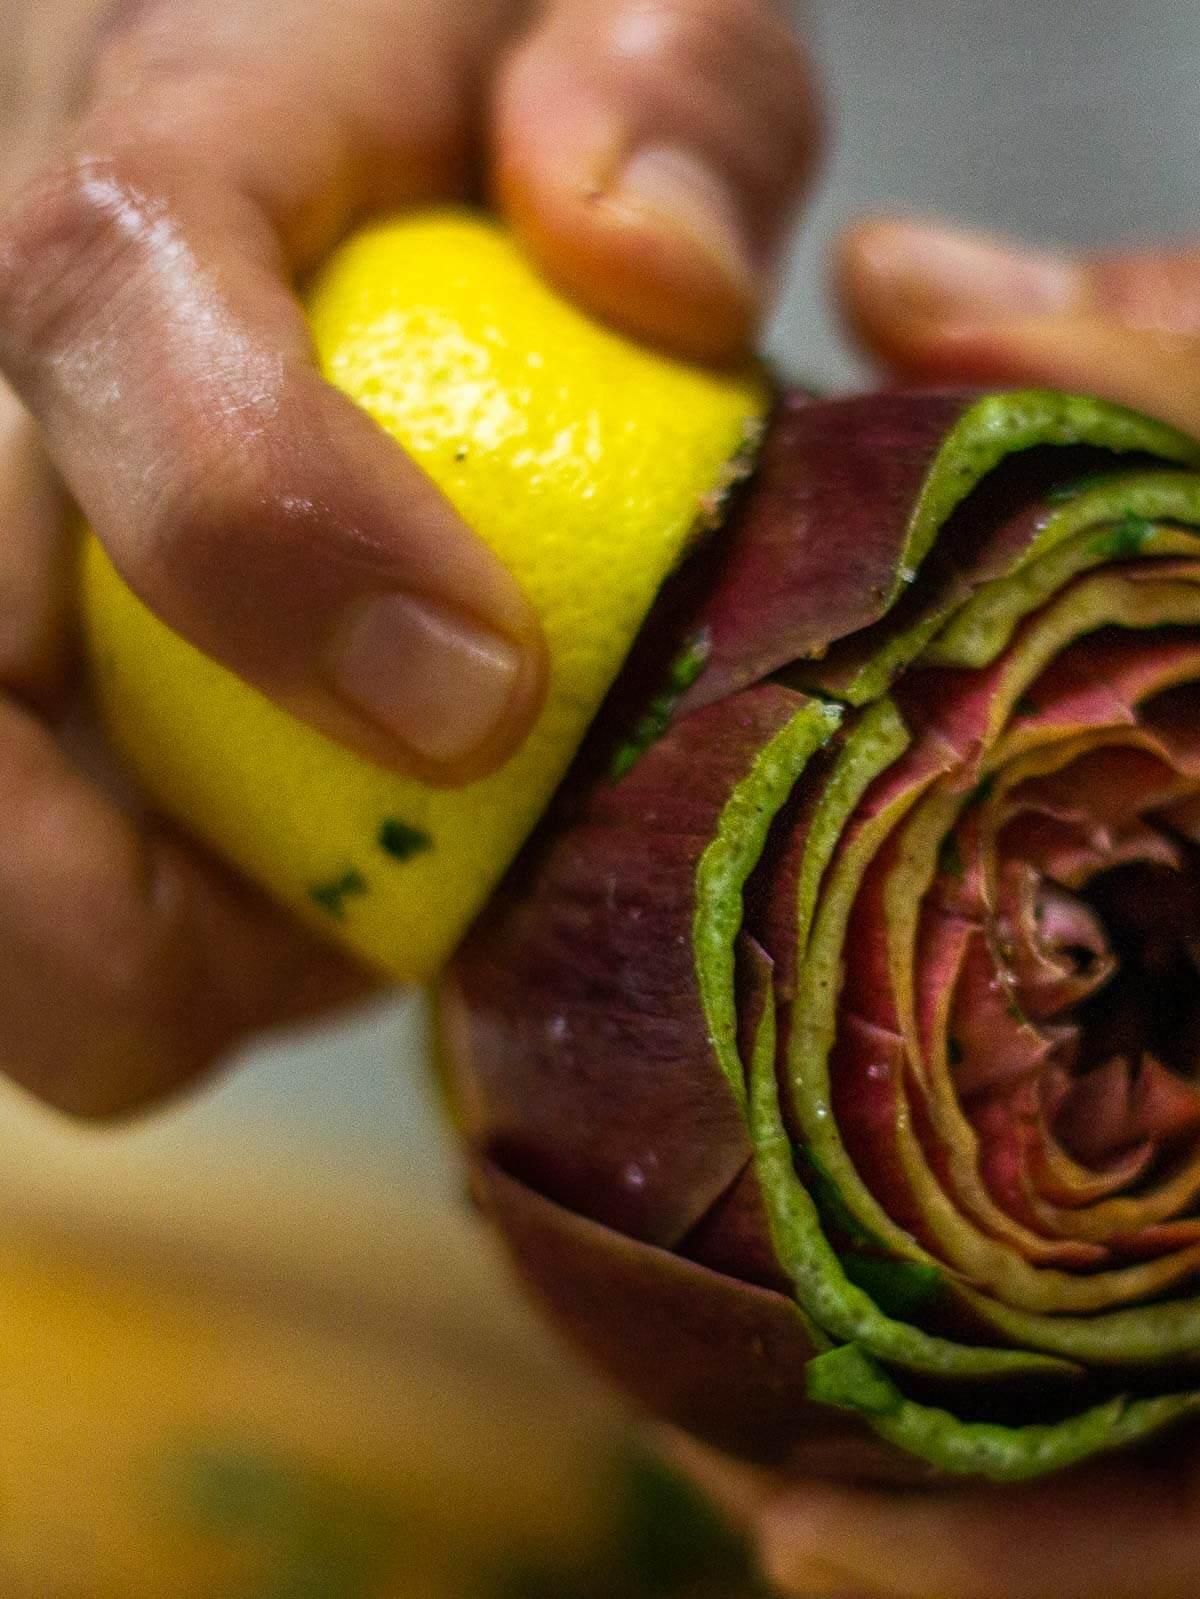 Brushing Artichokes with Lemon